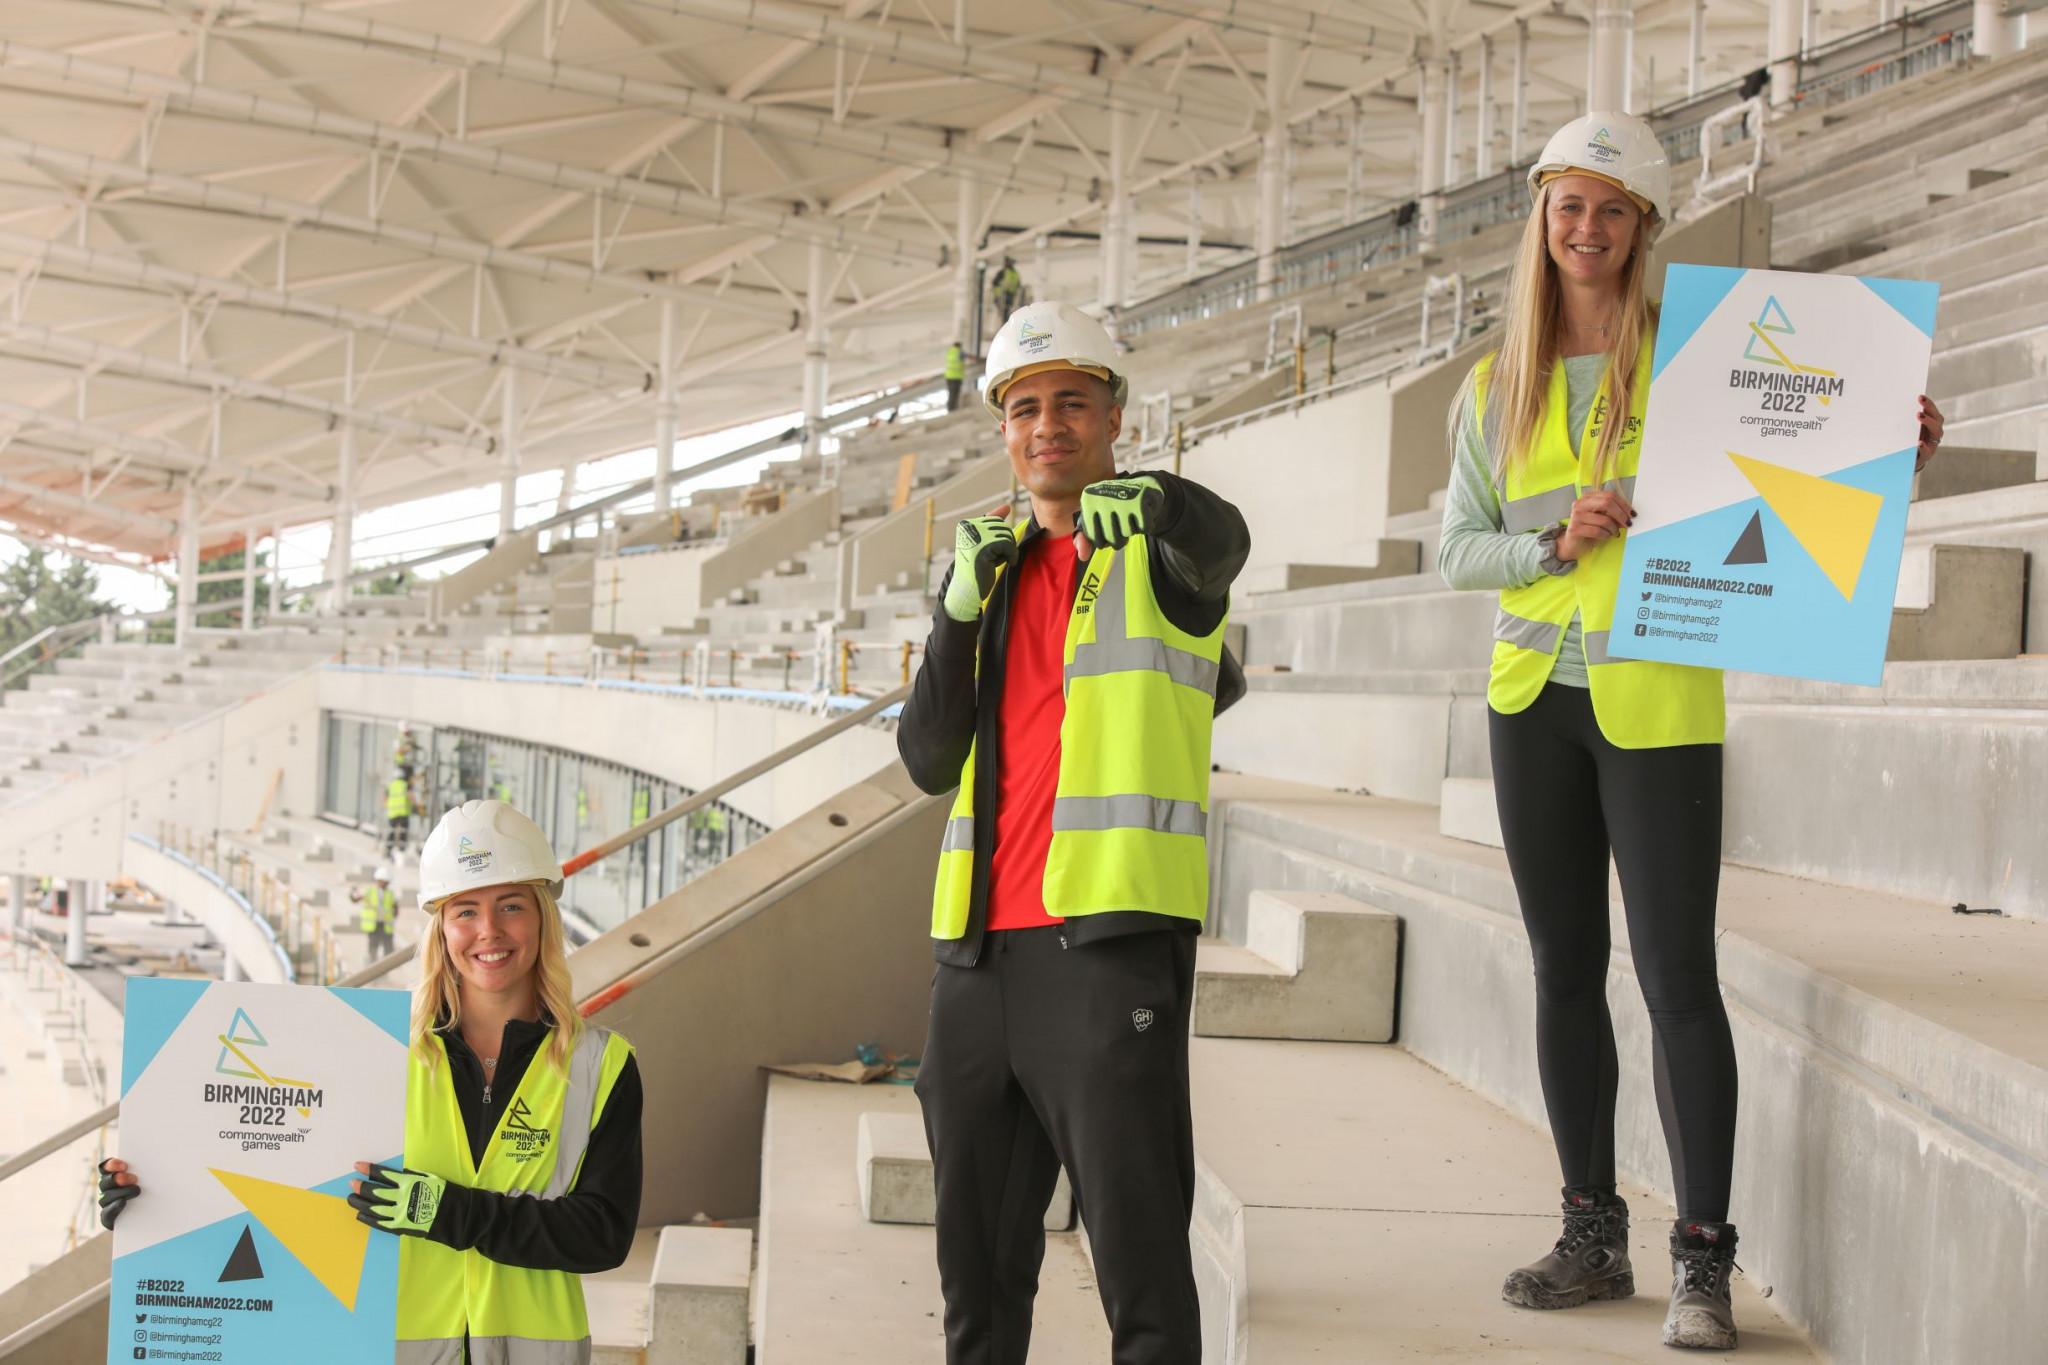 Kelly-Petersen Pollard, Delicious Orie and Hannah England pictured at the Alexander Stadium, Birmingham ©Birmingham 2022